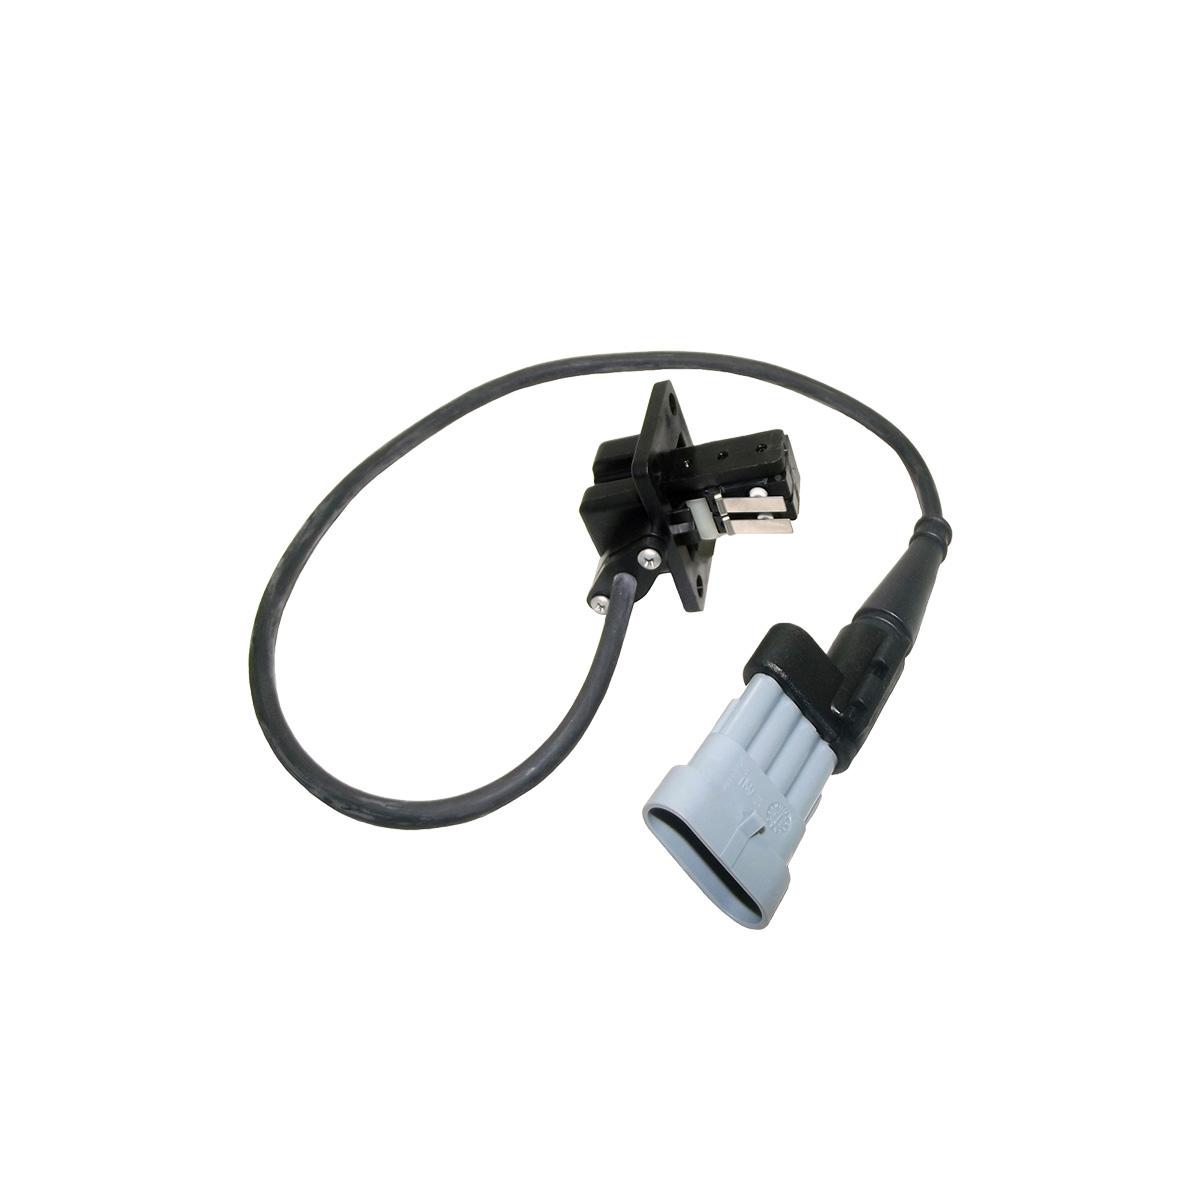 Interruptor Luz De Freio Valvula Pedal - CAVALLINO/CURSOR/EUROTECH/ONIBUS/STRALIS/TECTOR